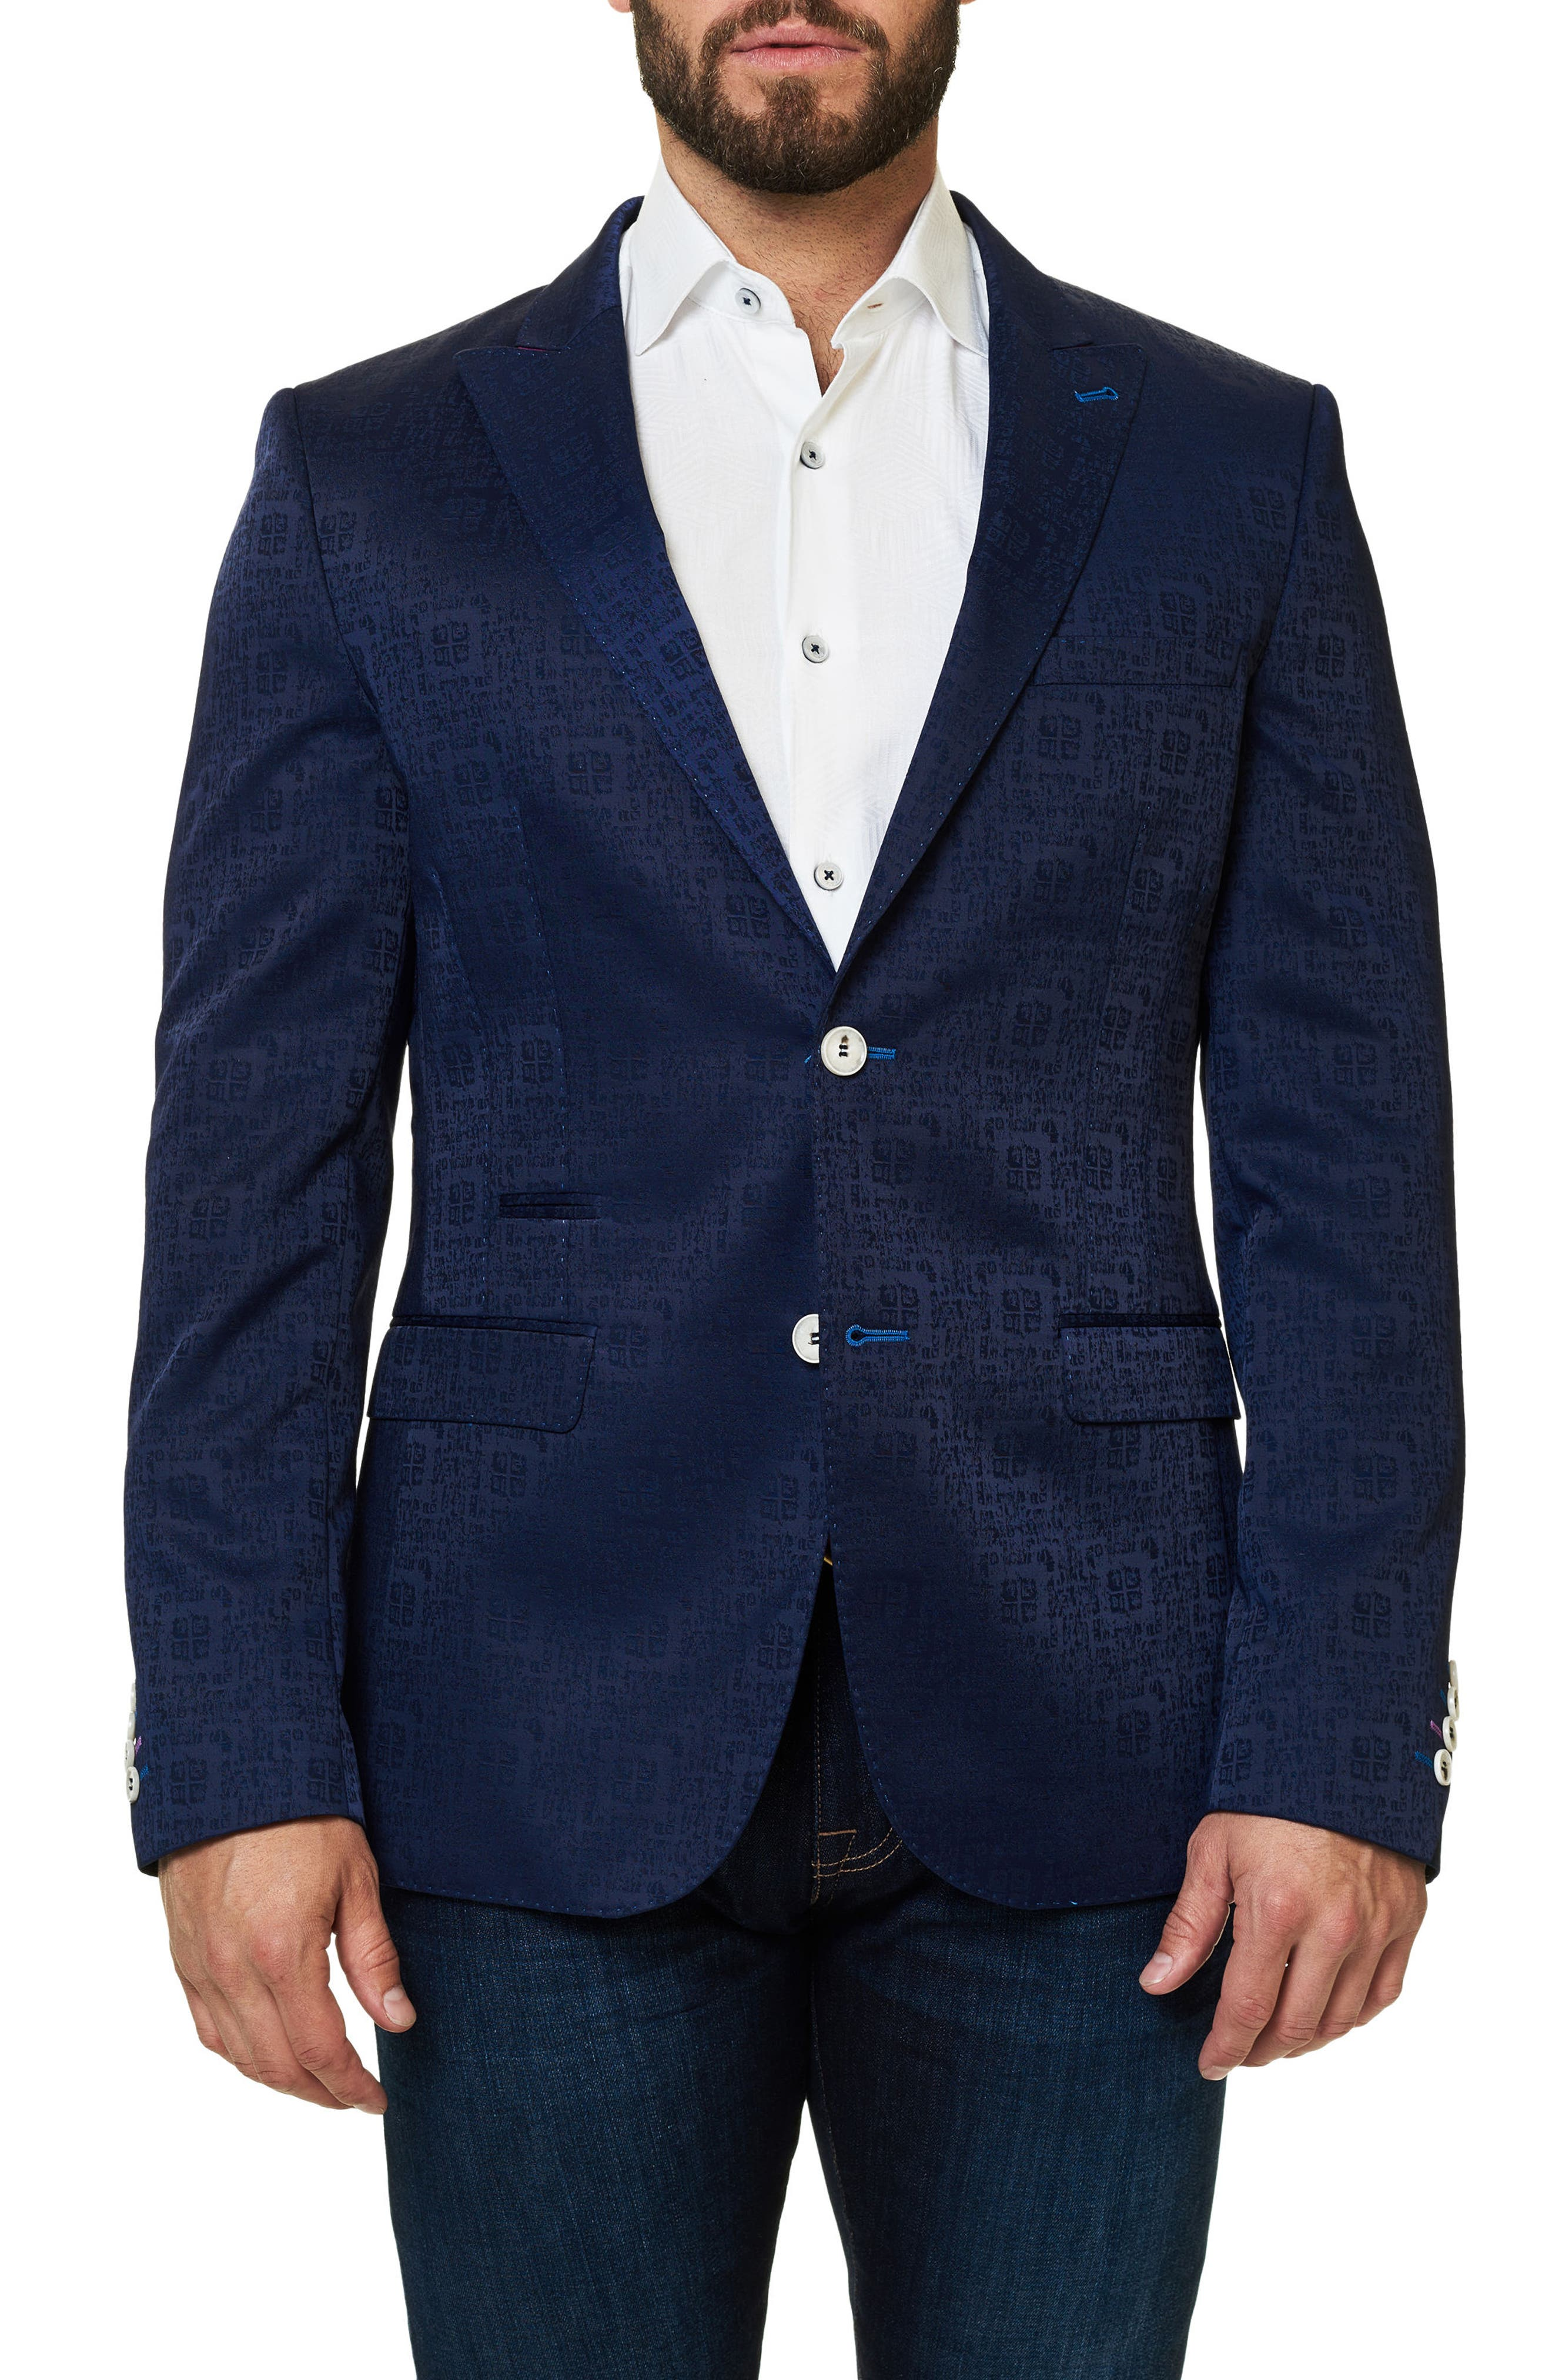 Main Image - Maceoo Elegance Jacquard Sport Coat